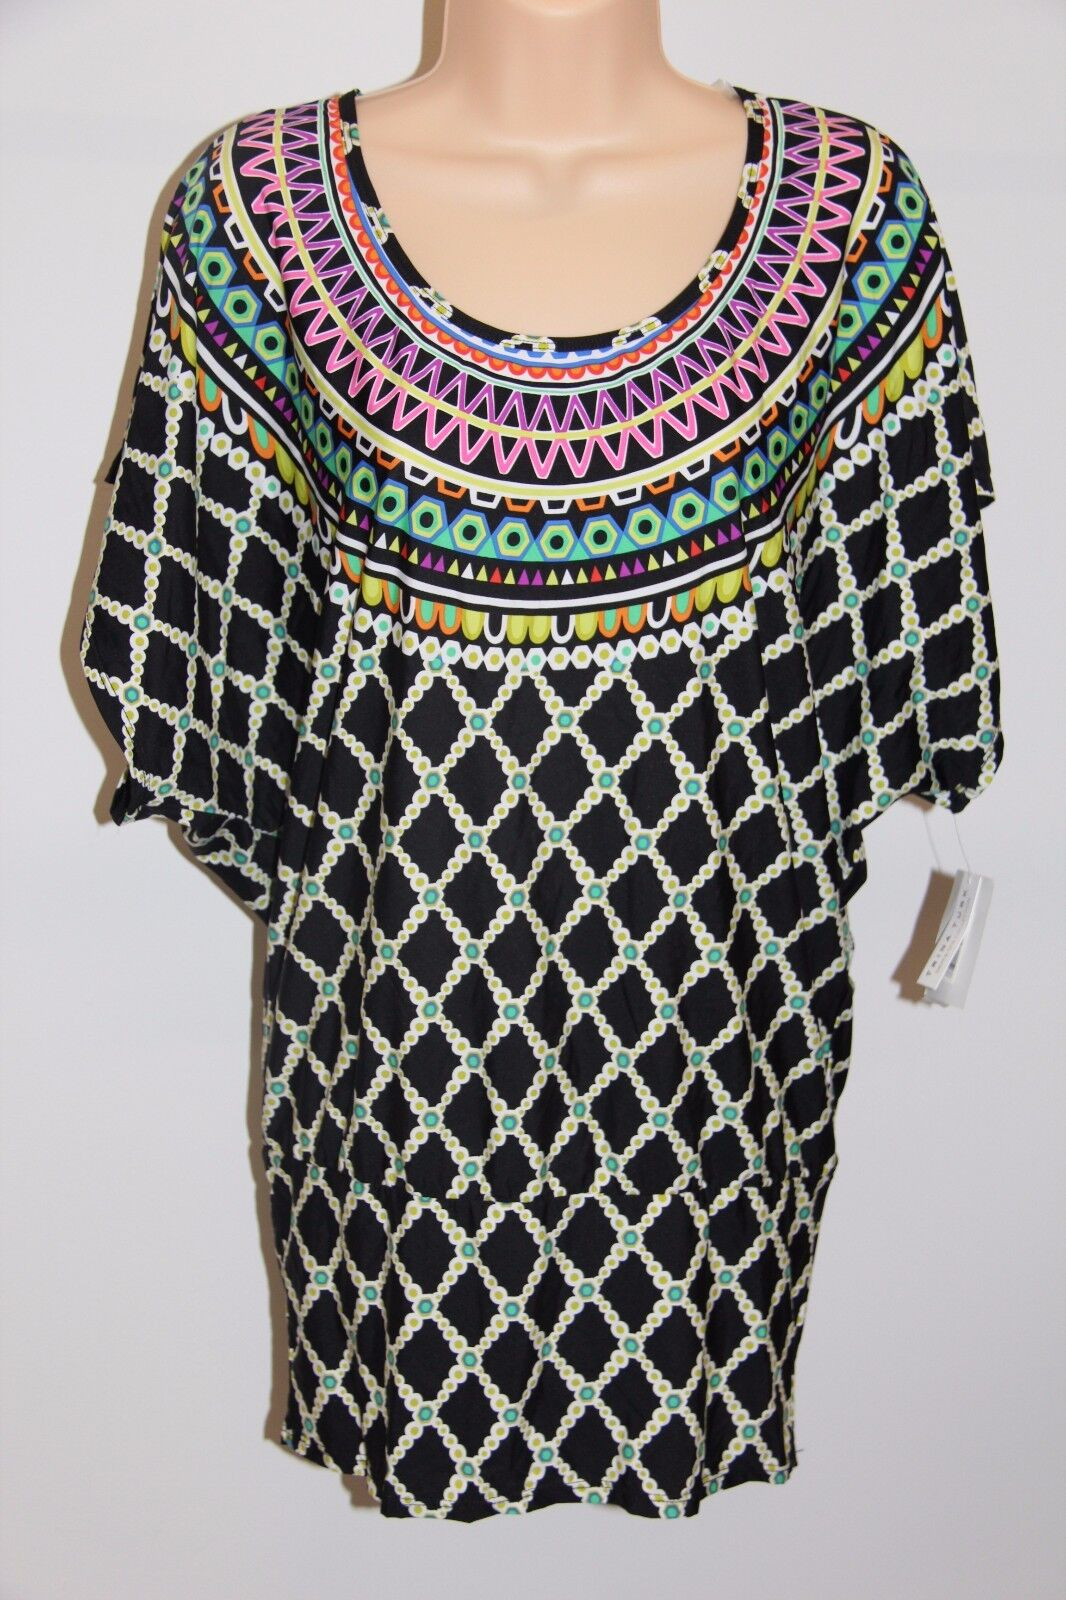 NWT Trina Turk Swimsuit Bikini Cover Up Dress Tunic Size S Multi BLK color